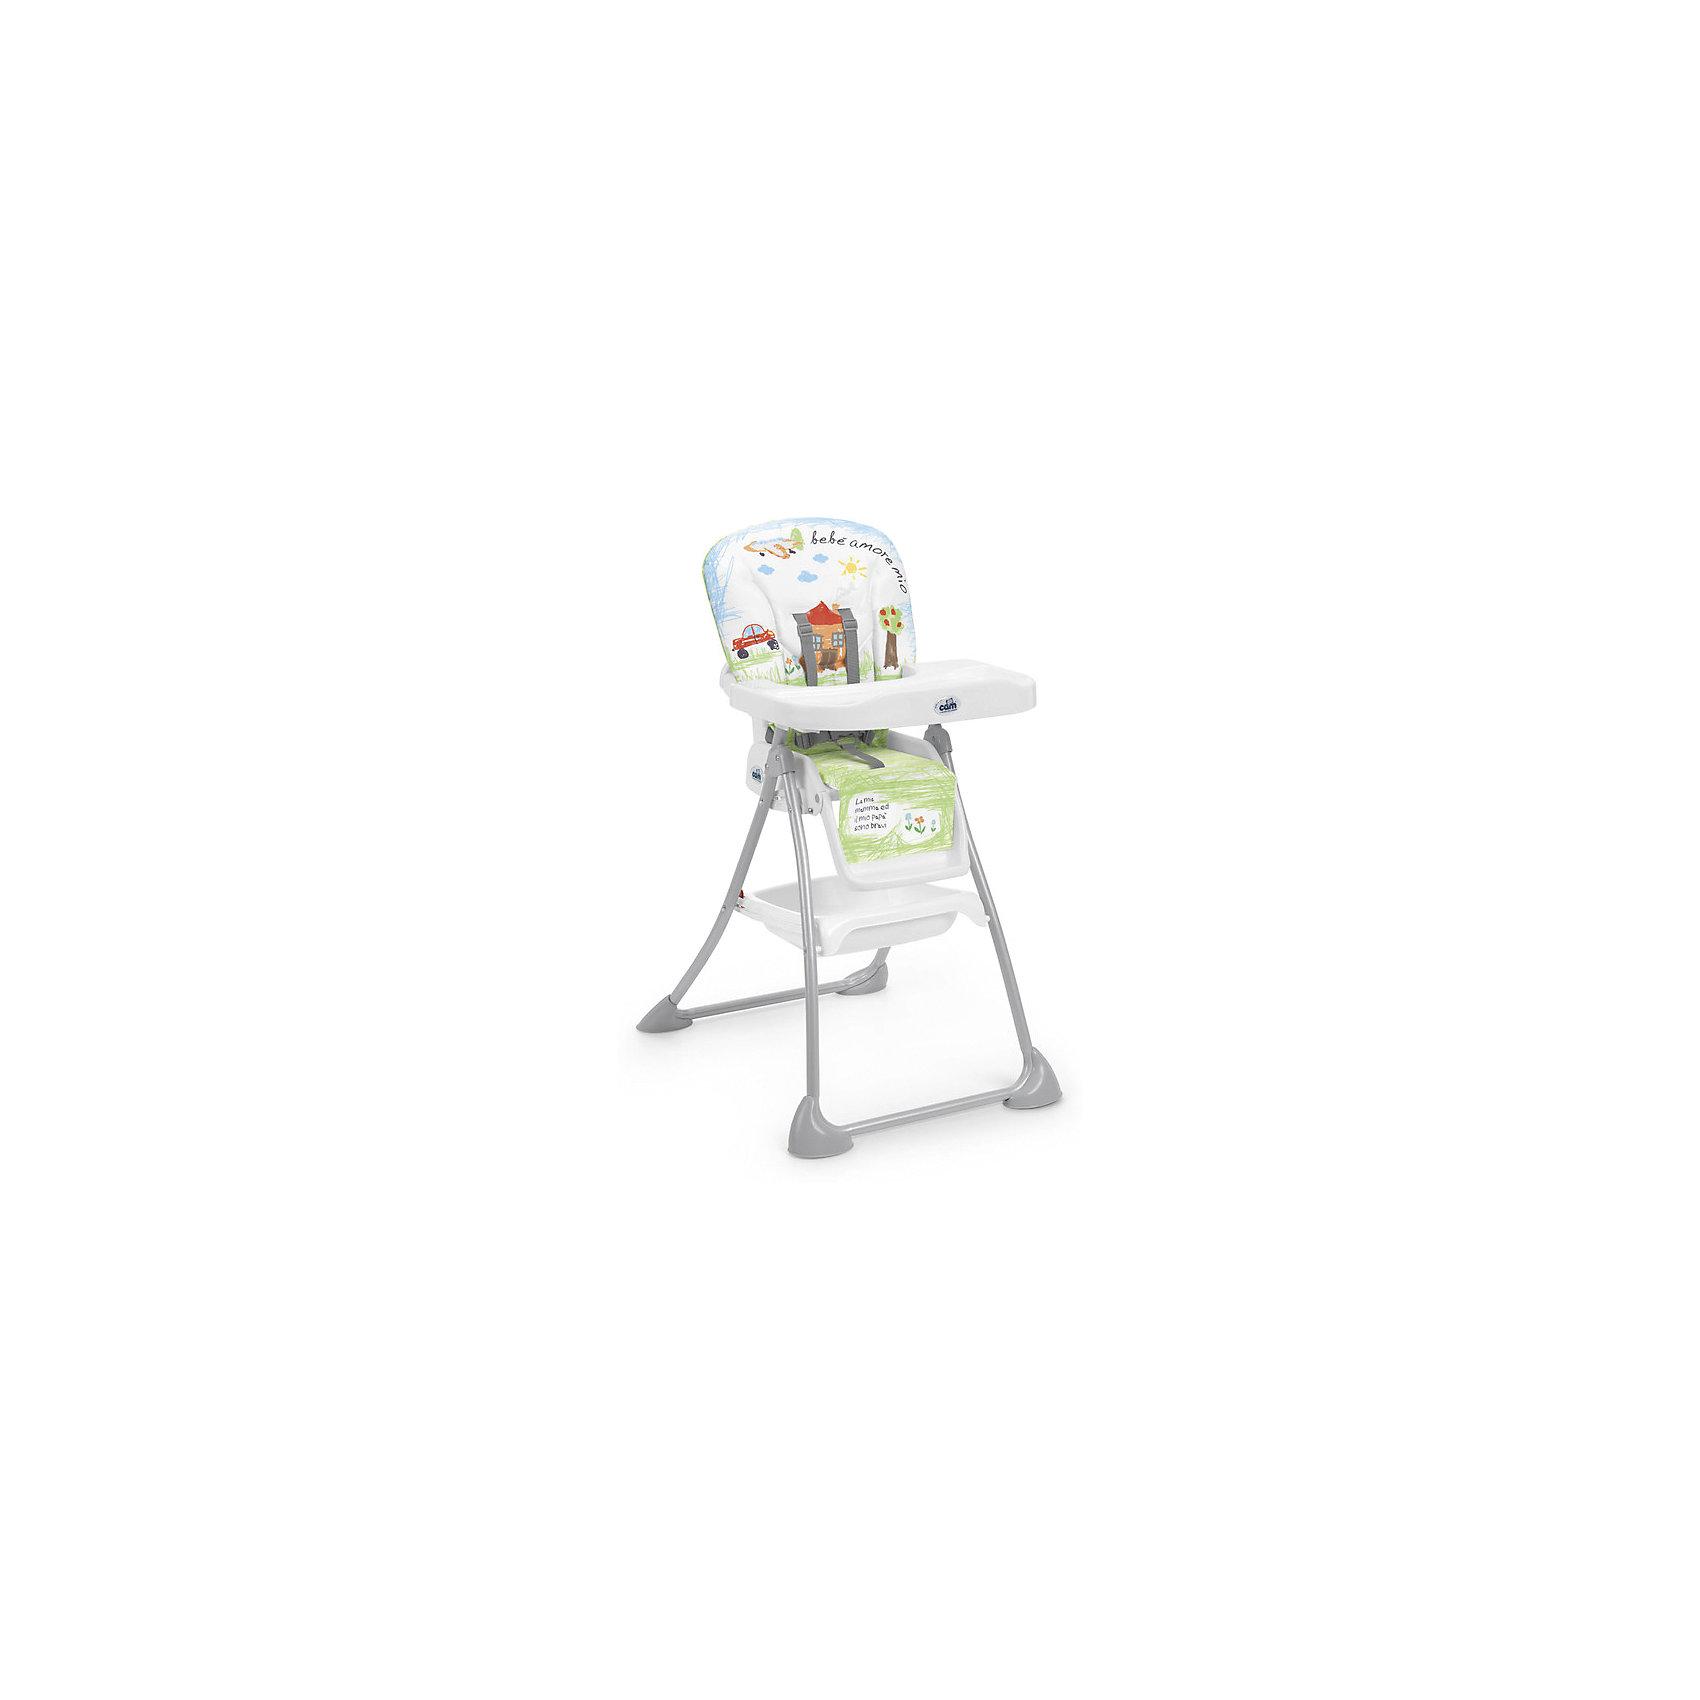 CAM Стульчик для кормления Mini Plus, CAM, Bebe amore mio cam стульчик для кормления smarty pop cam салатовый bebe amore mio page 7